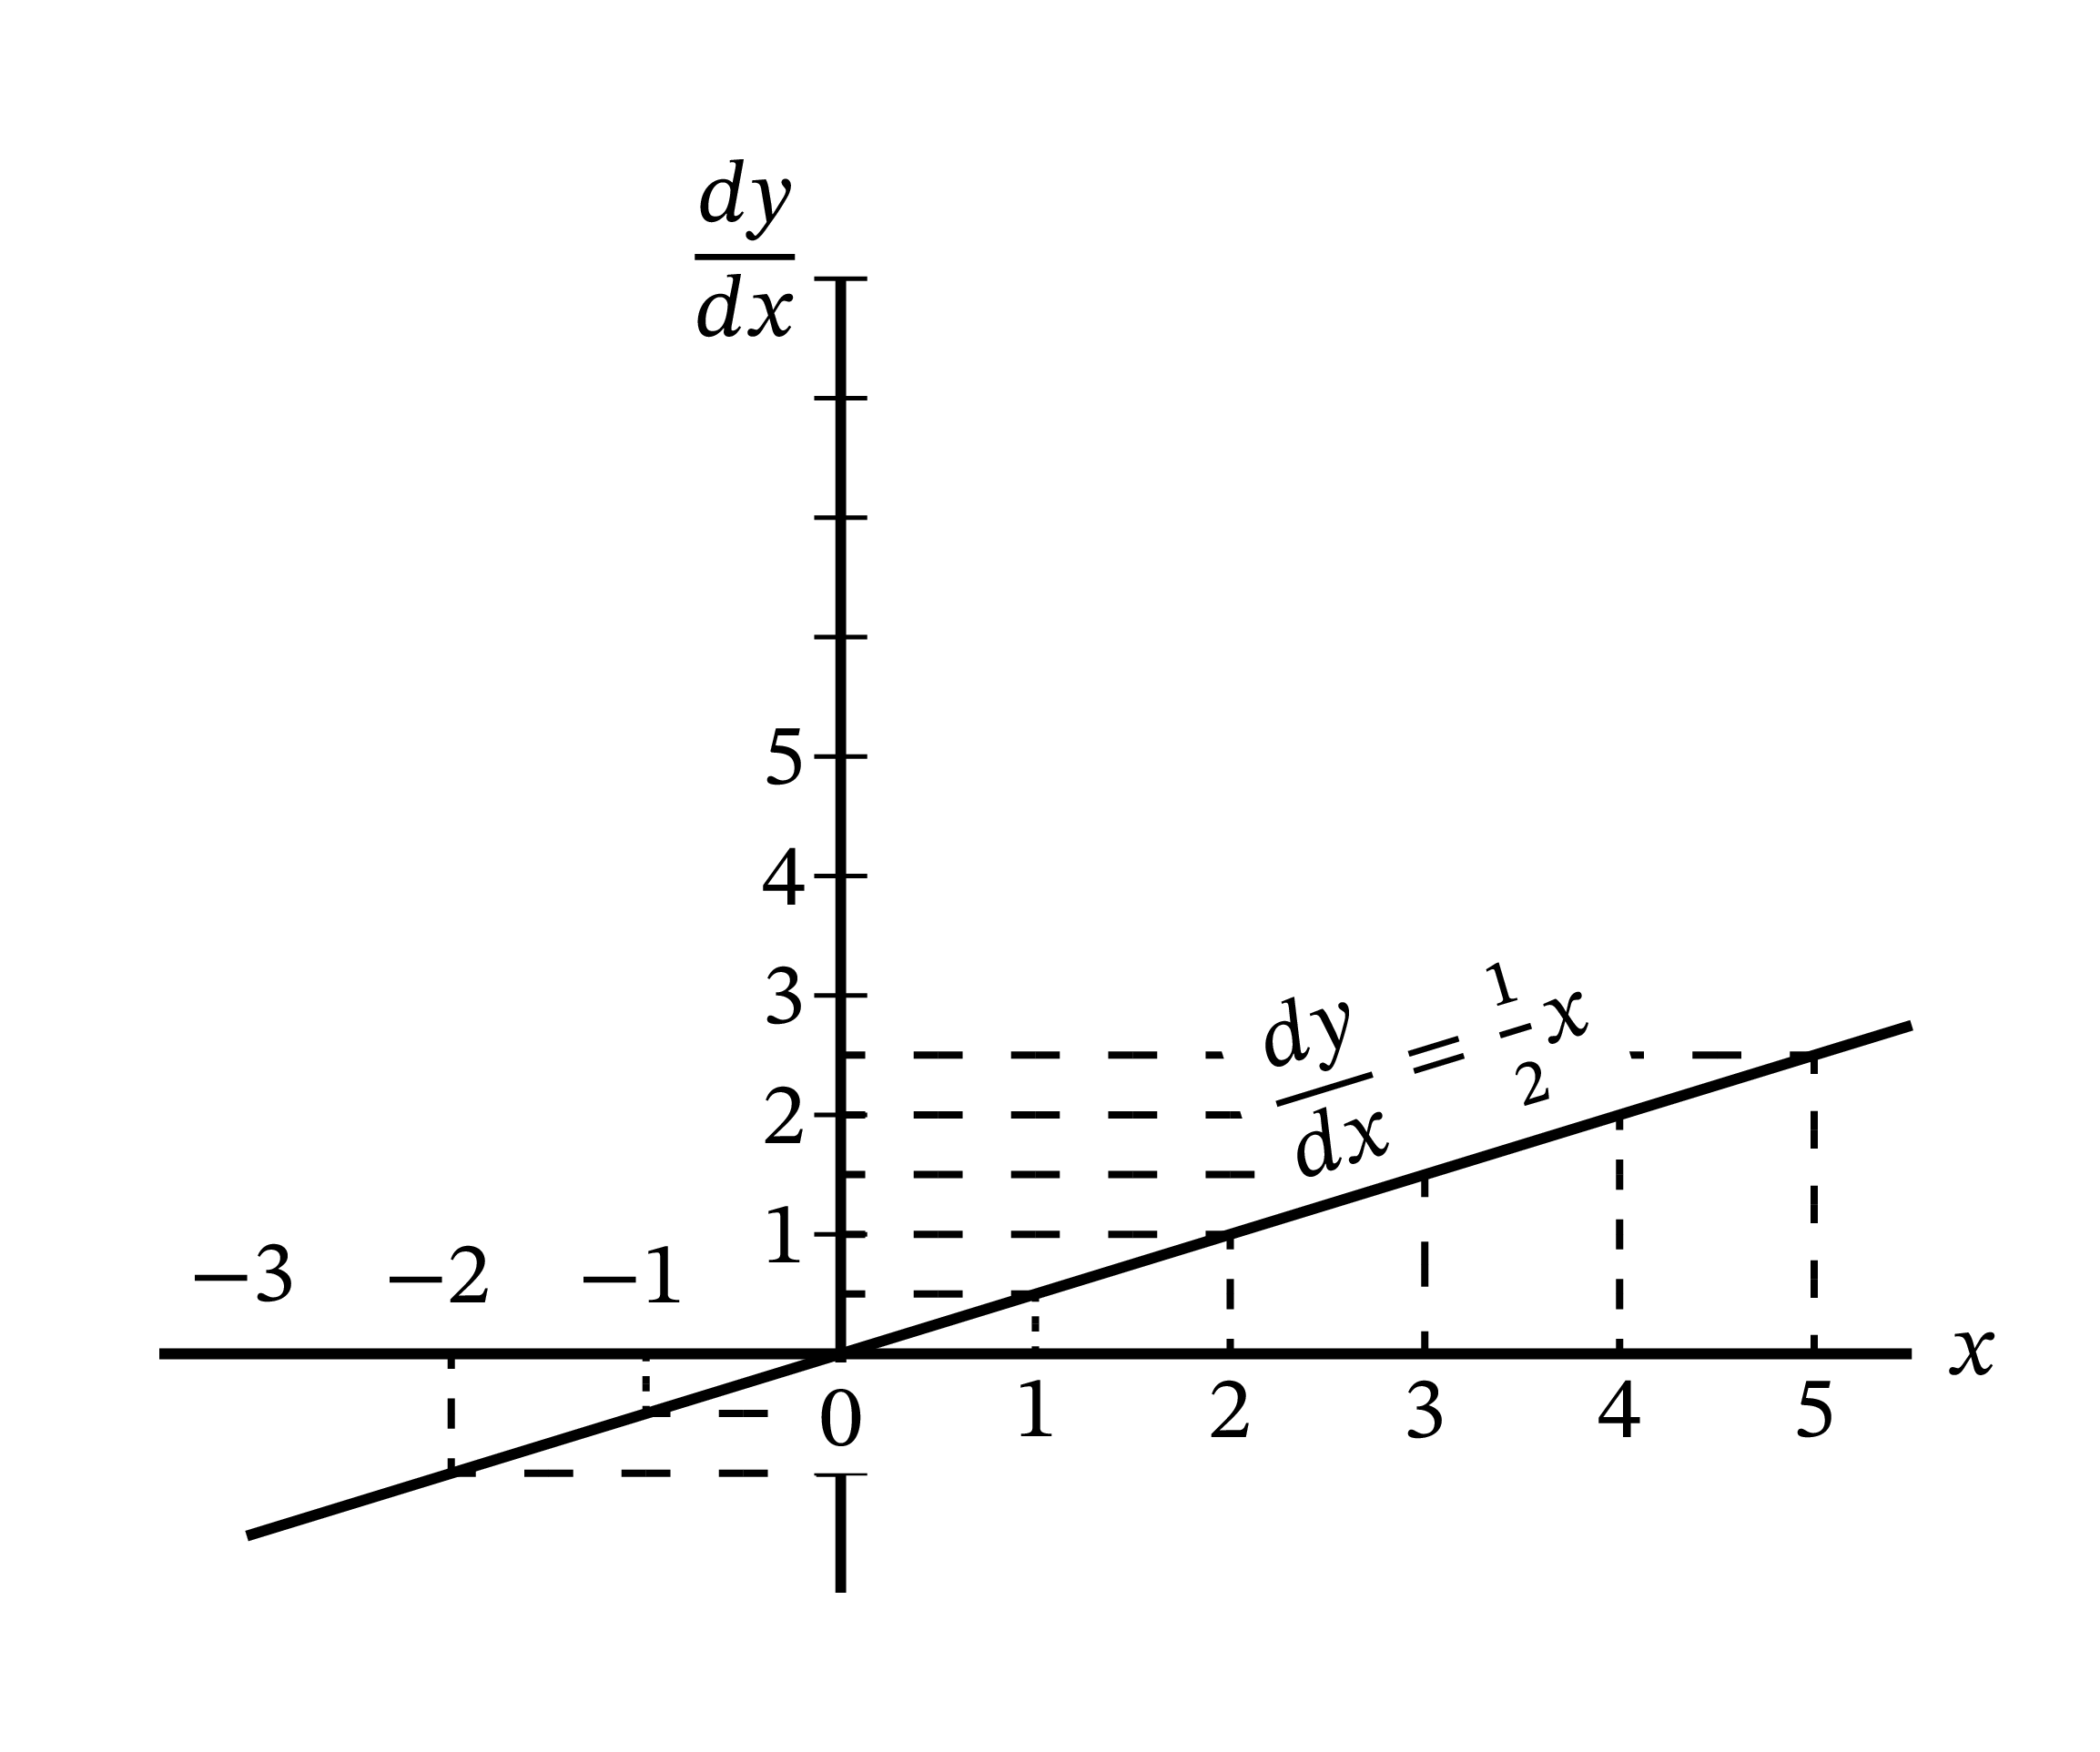 X. 微分の幾何學的な意味 - かんたん微積分